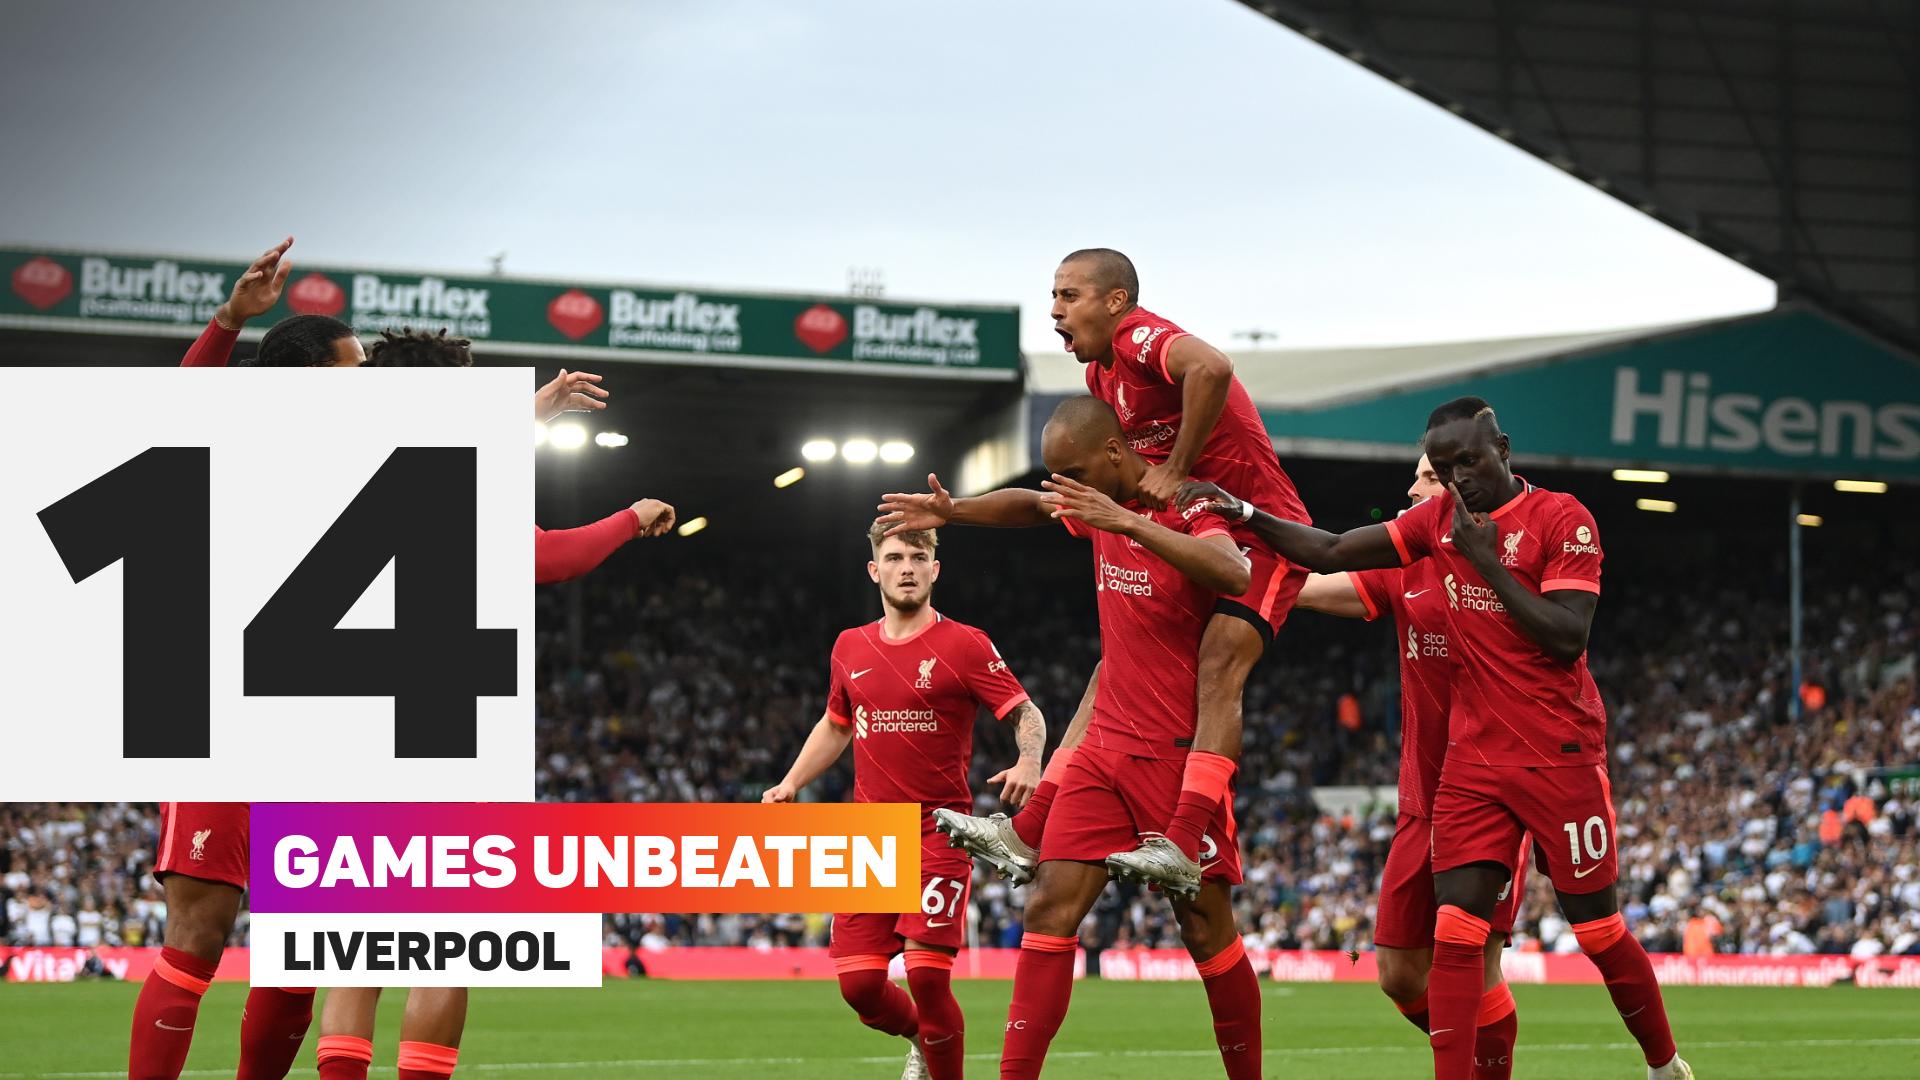 Liverpool are on a long unbeaten run